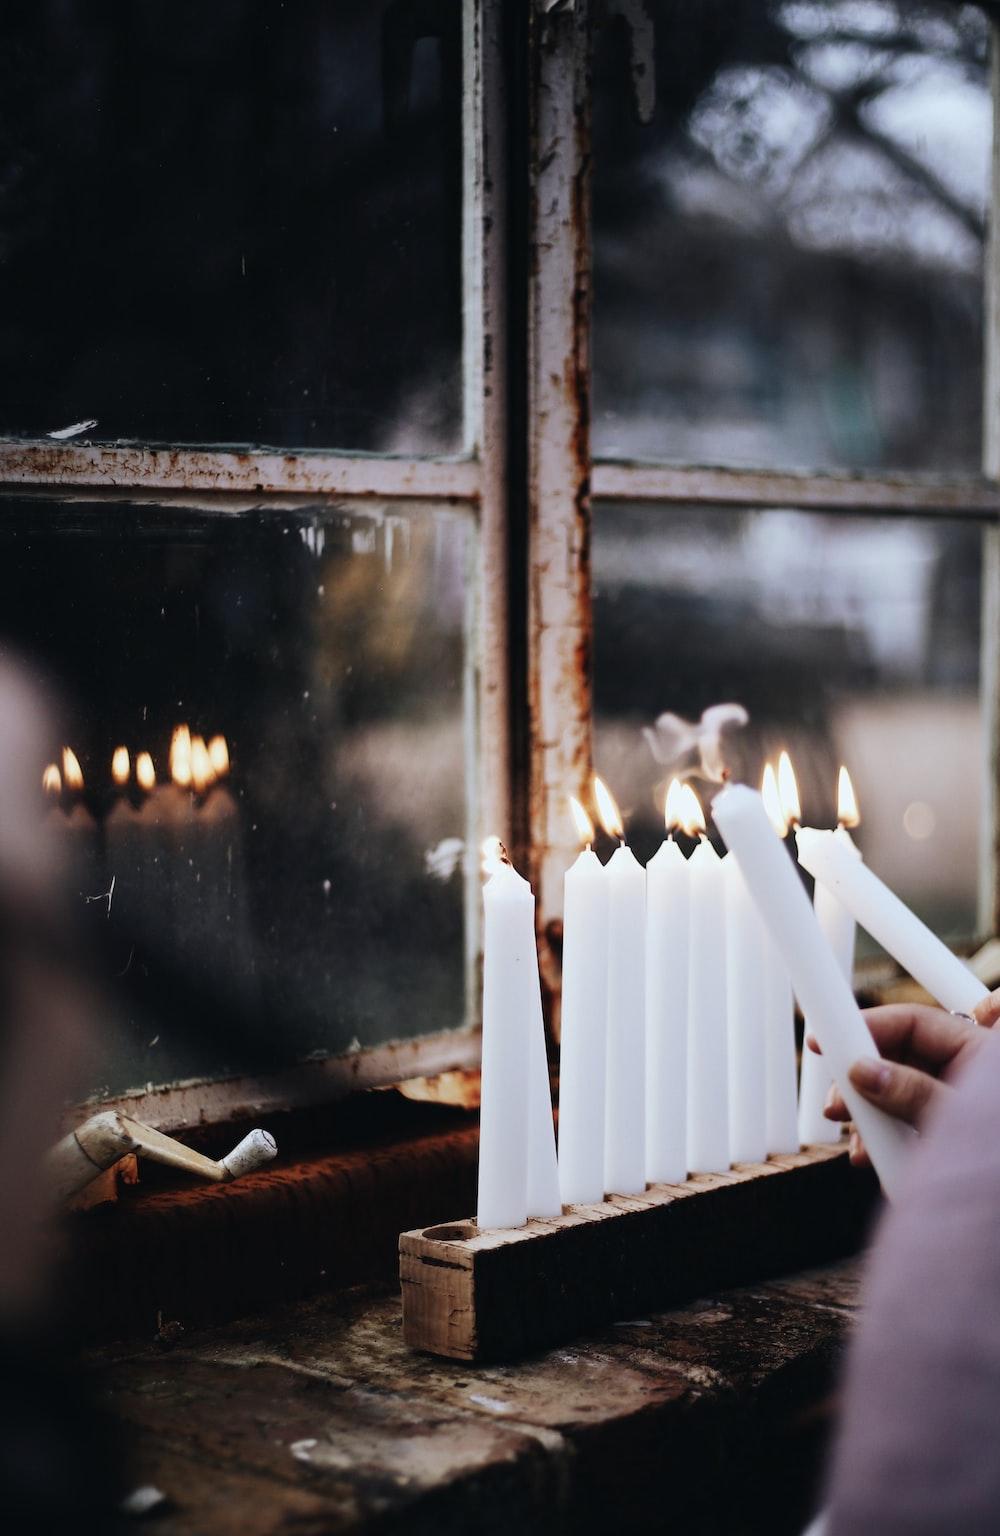 person lighting white candlesticks in a rack near glass windowpane